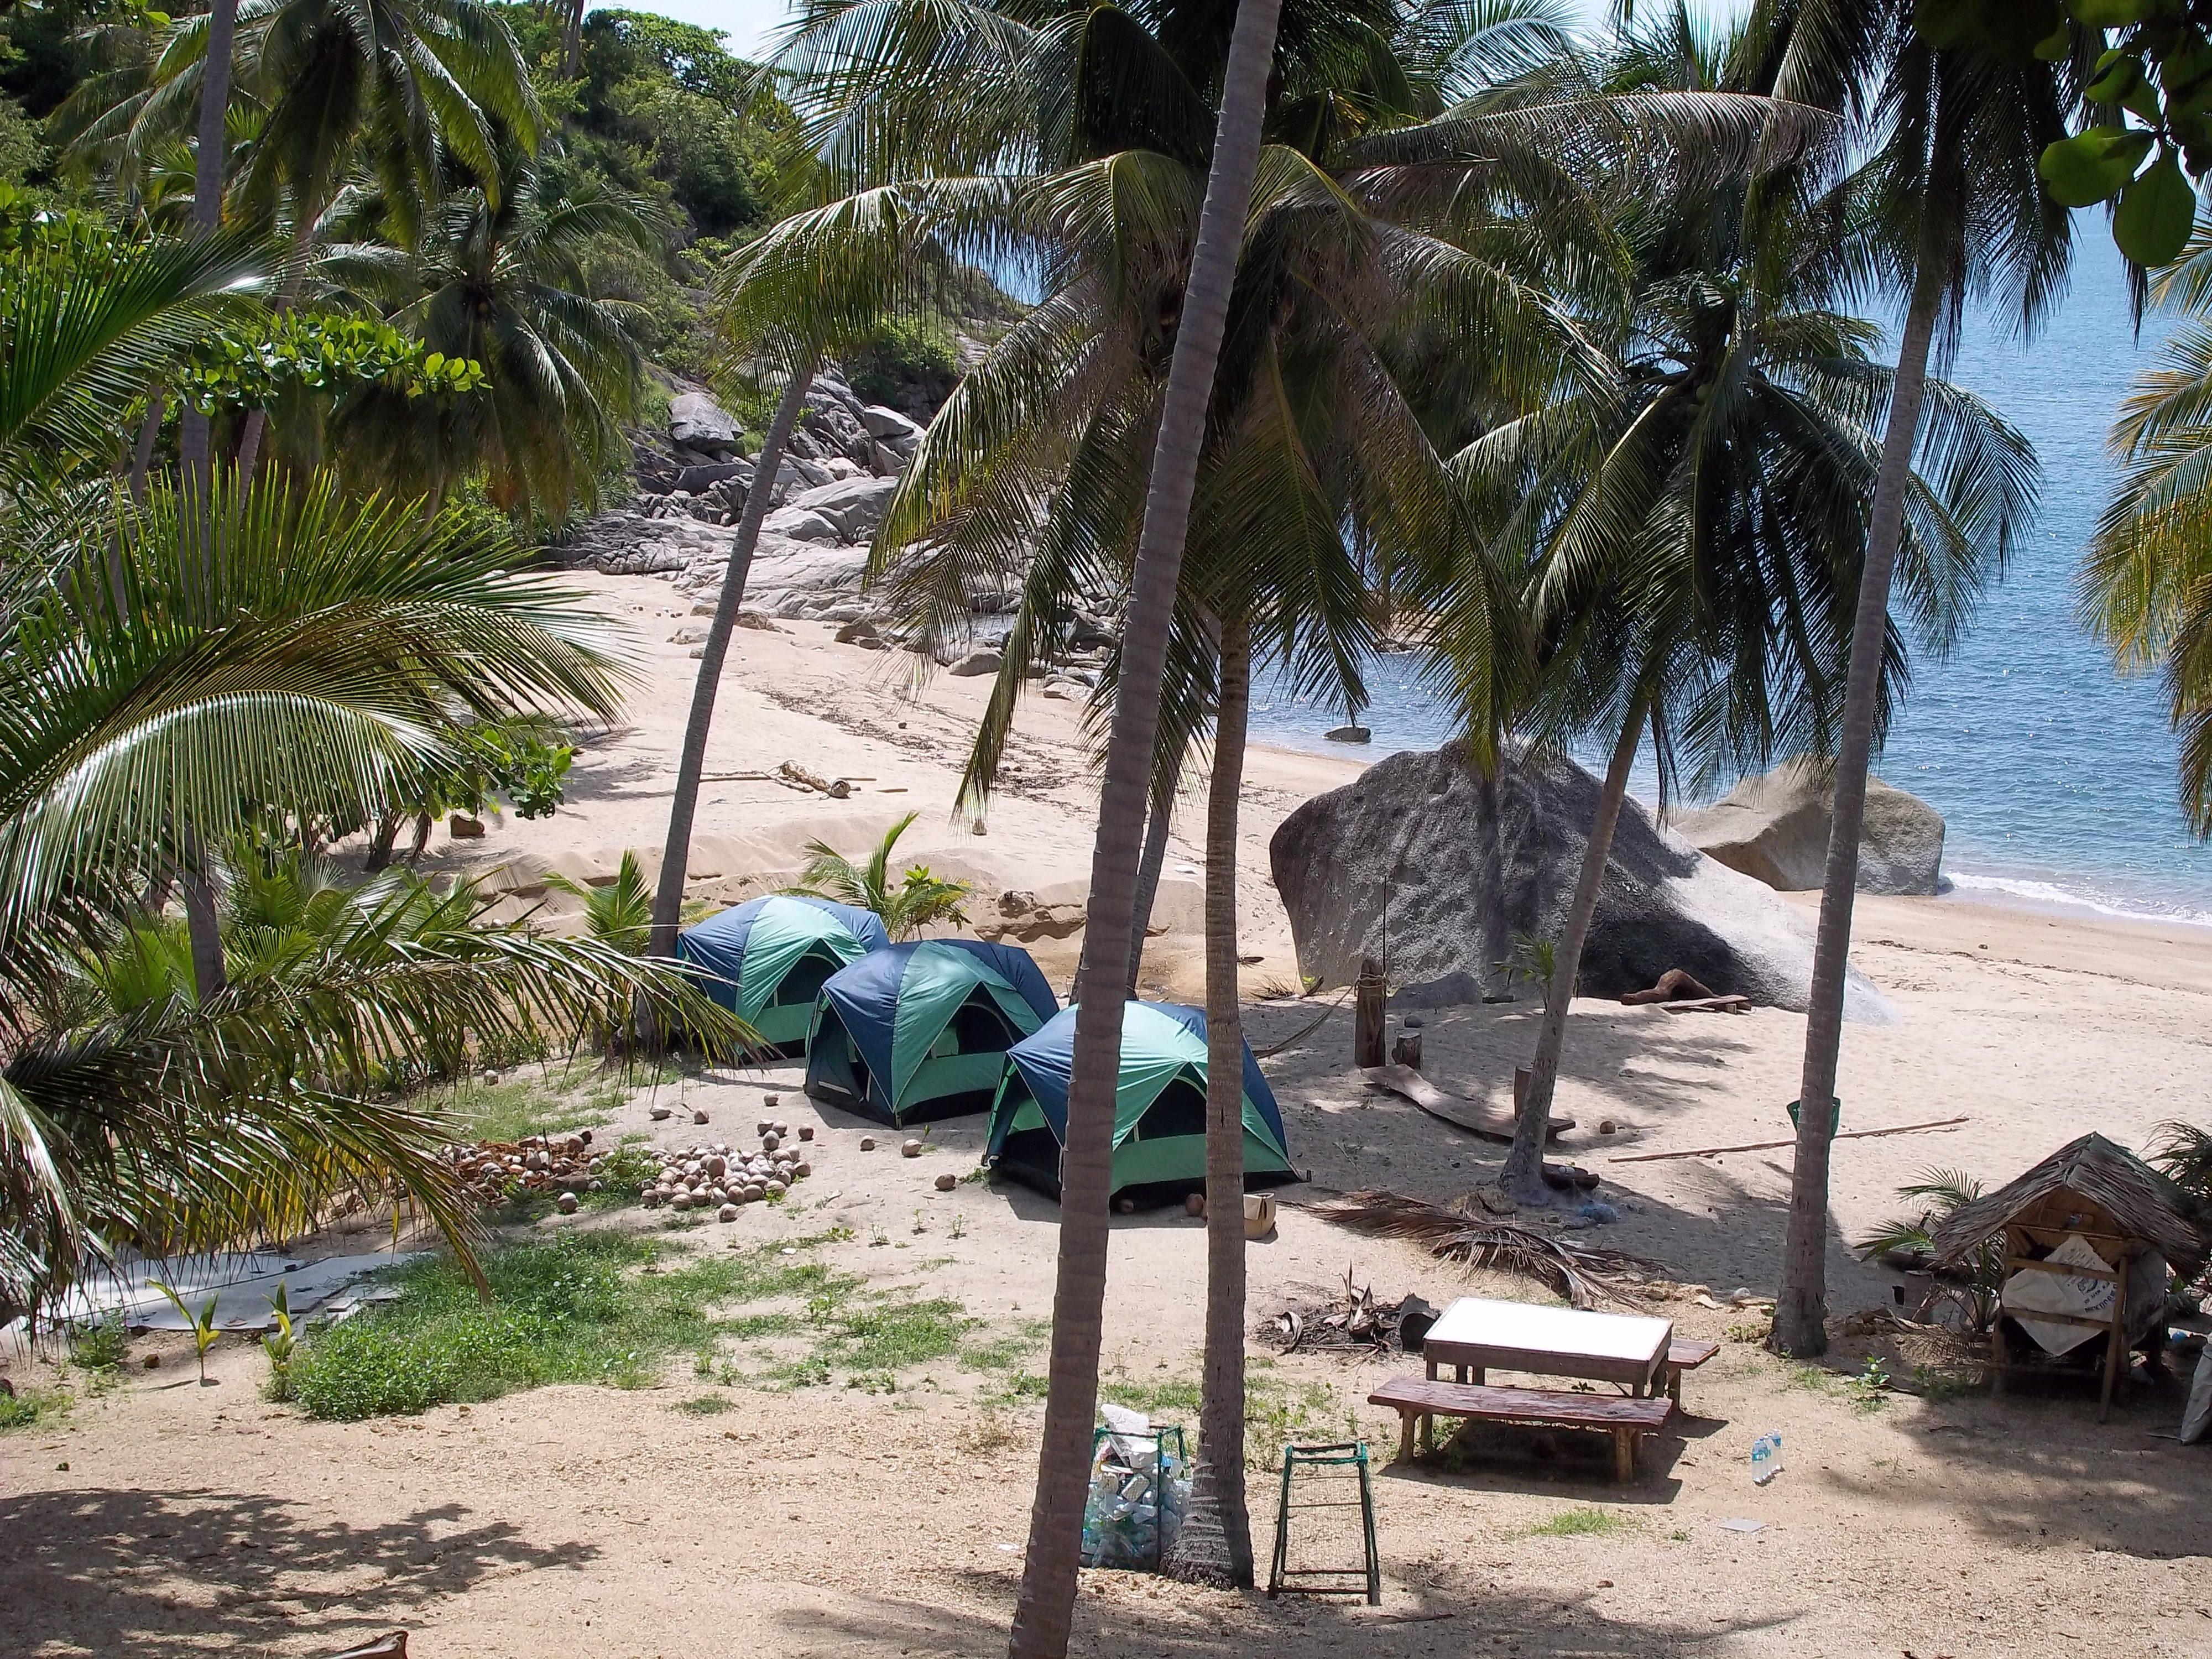 Camping at Haad Nam Tok